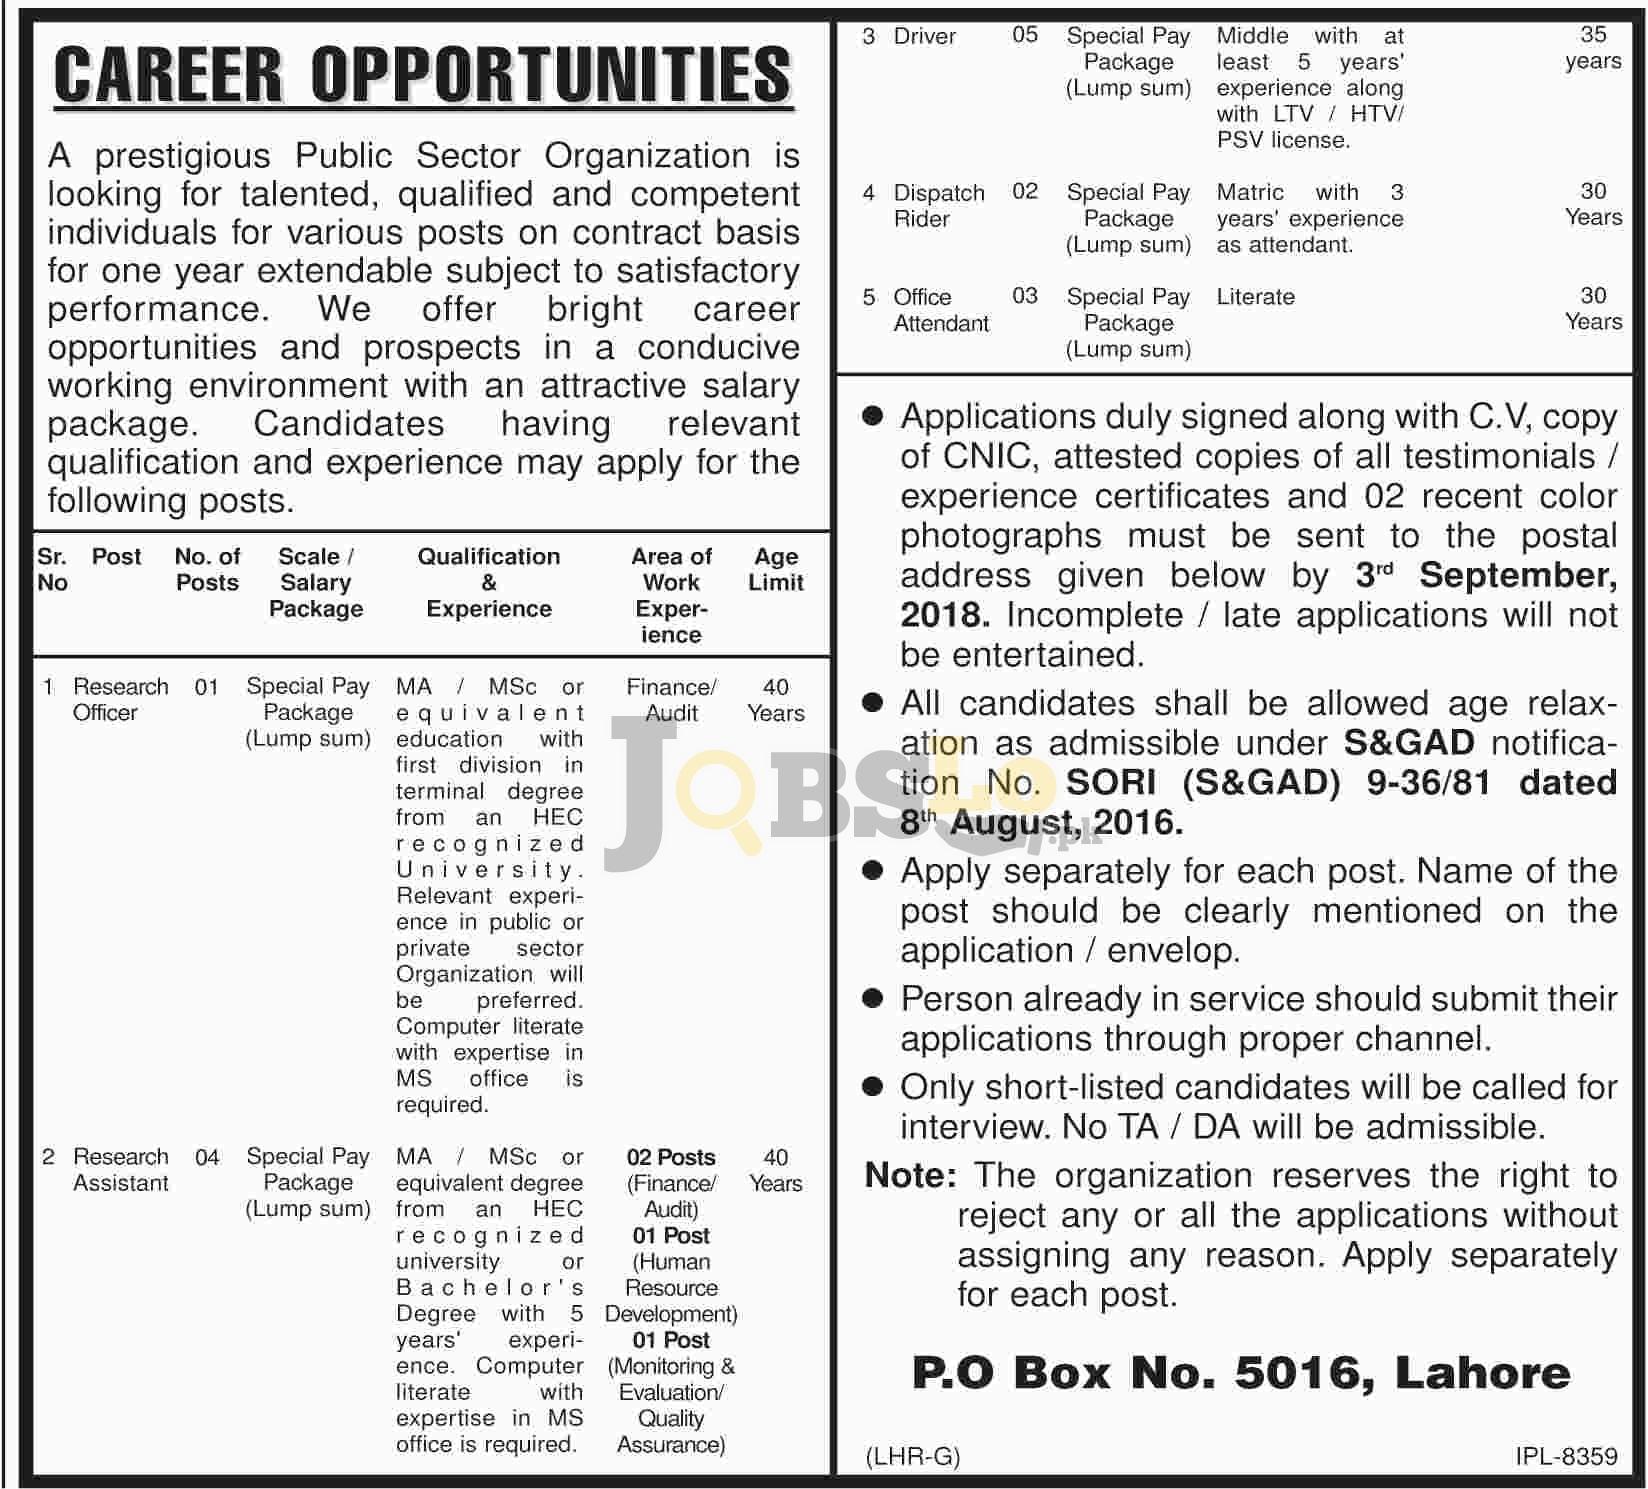 PO Box 5016 Lahore Jobs 18 August 2018 Prestigious Public Sector Organization